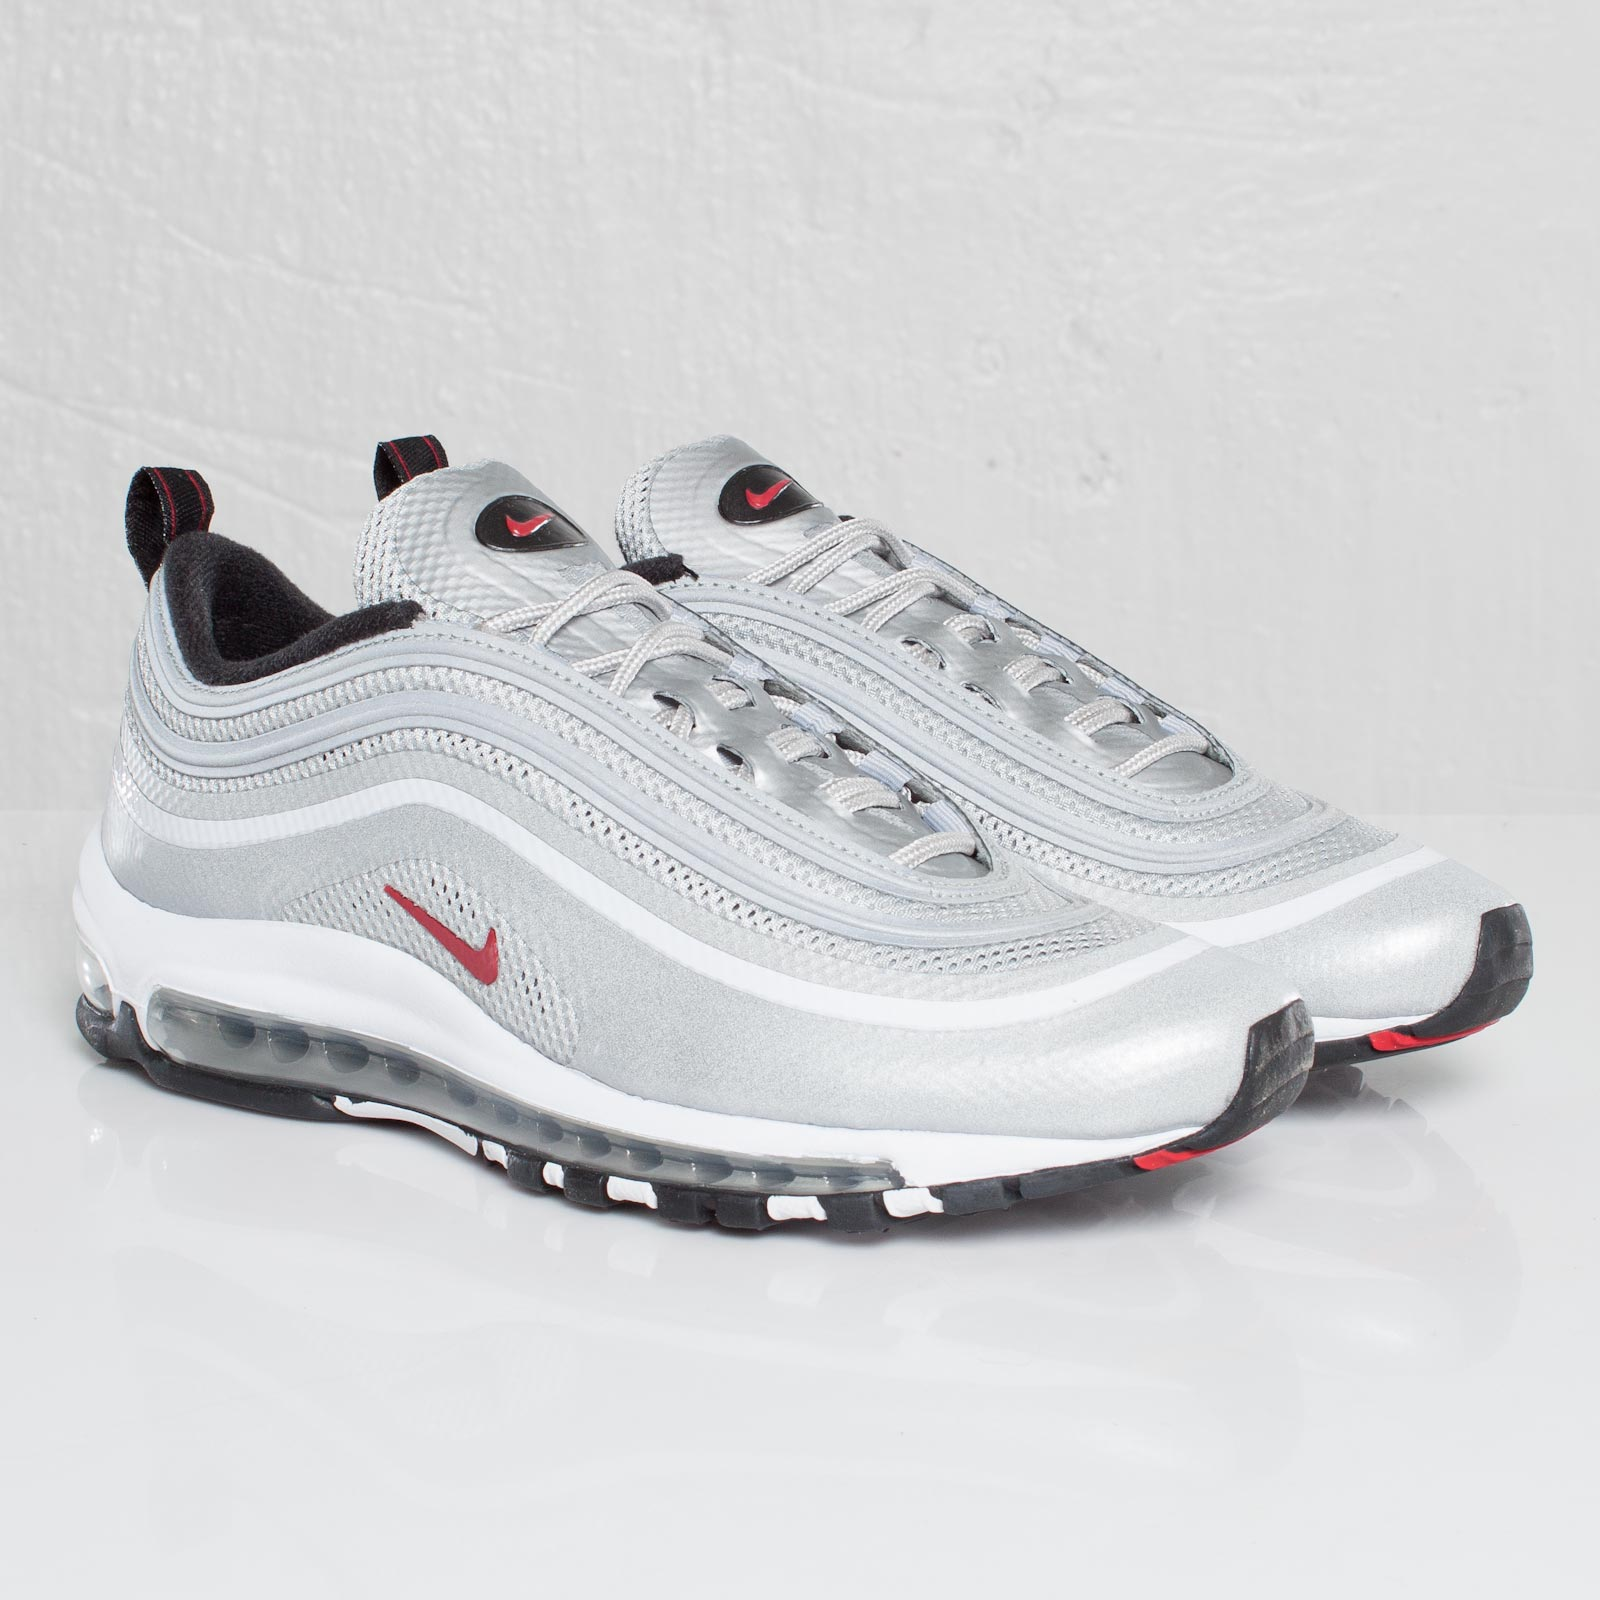 6b75191b6082 Nike Air Max 97 Premium NRG - 542427-060 - Sneakersnstuff